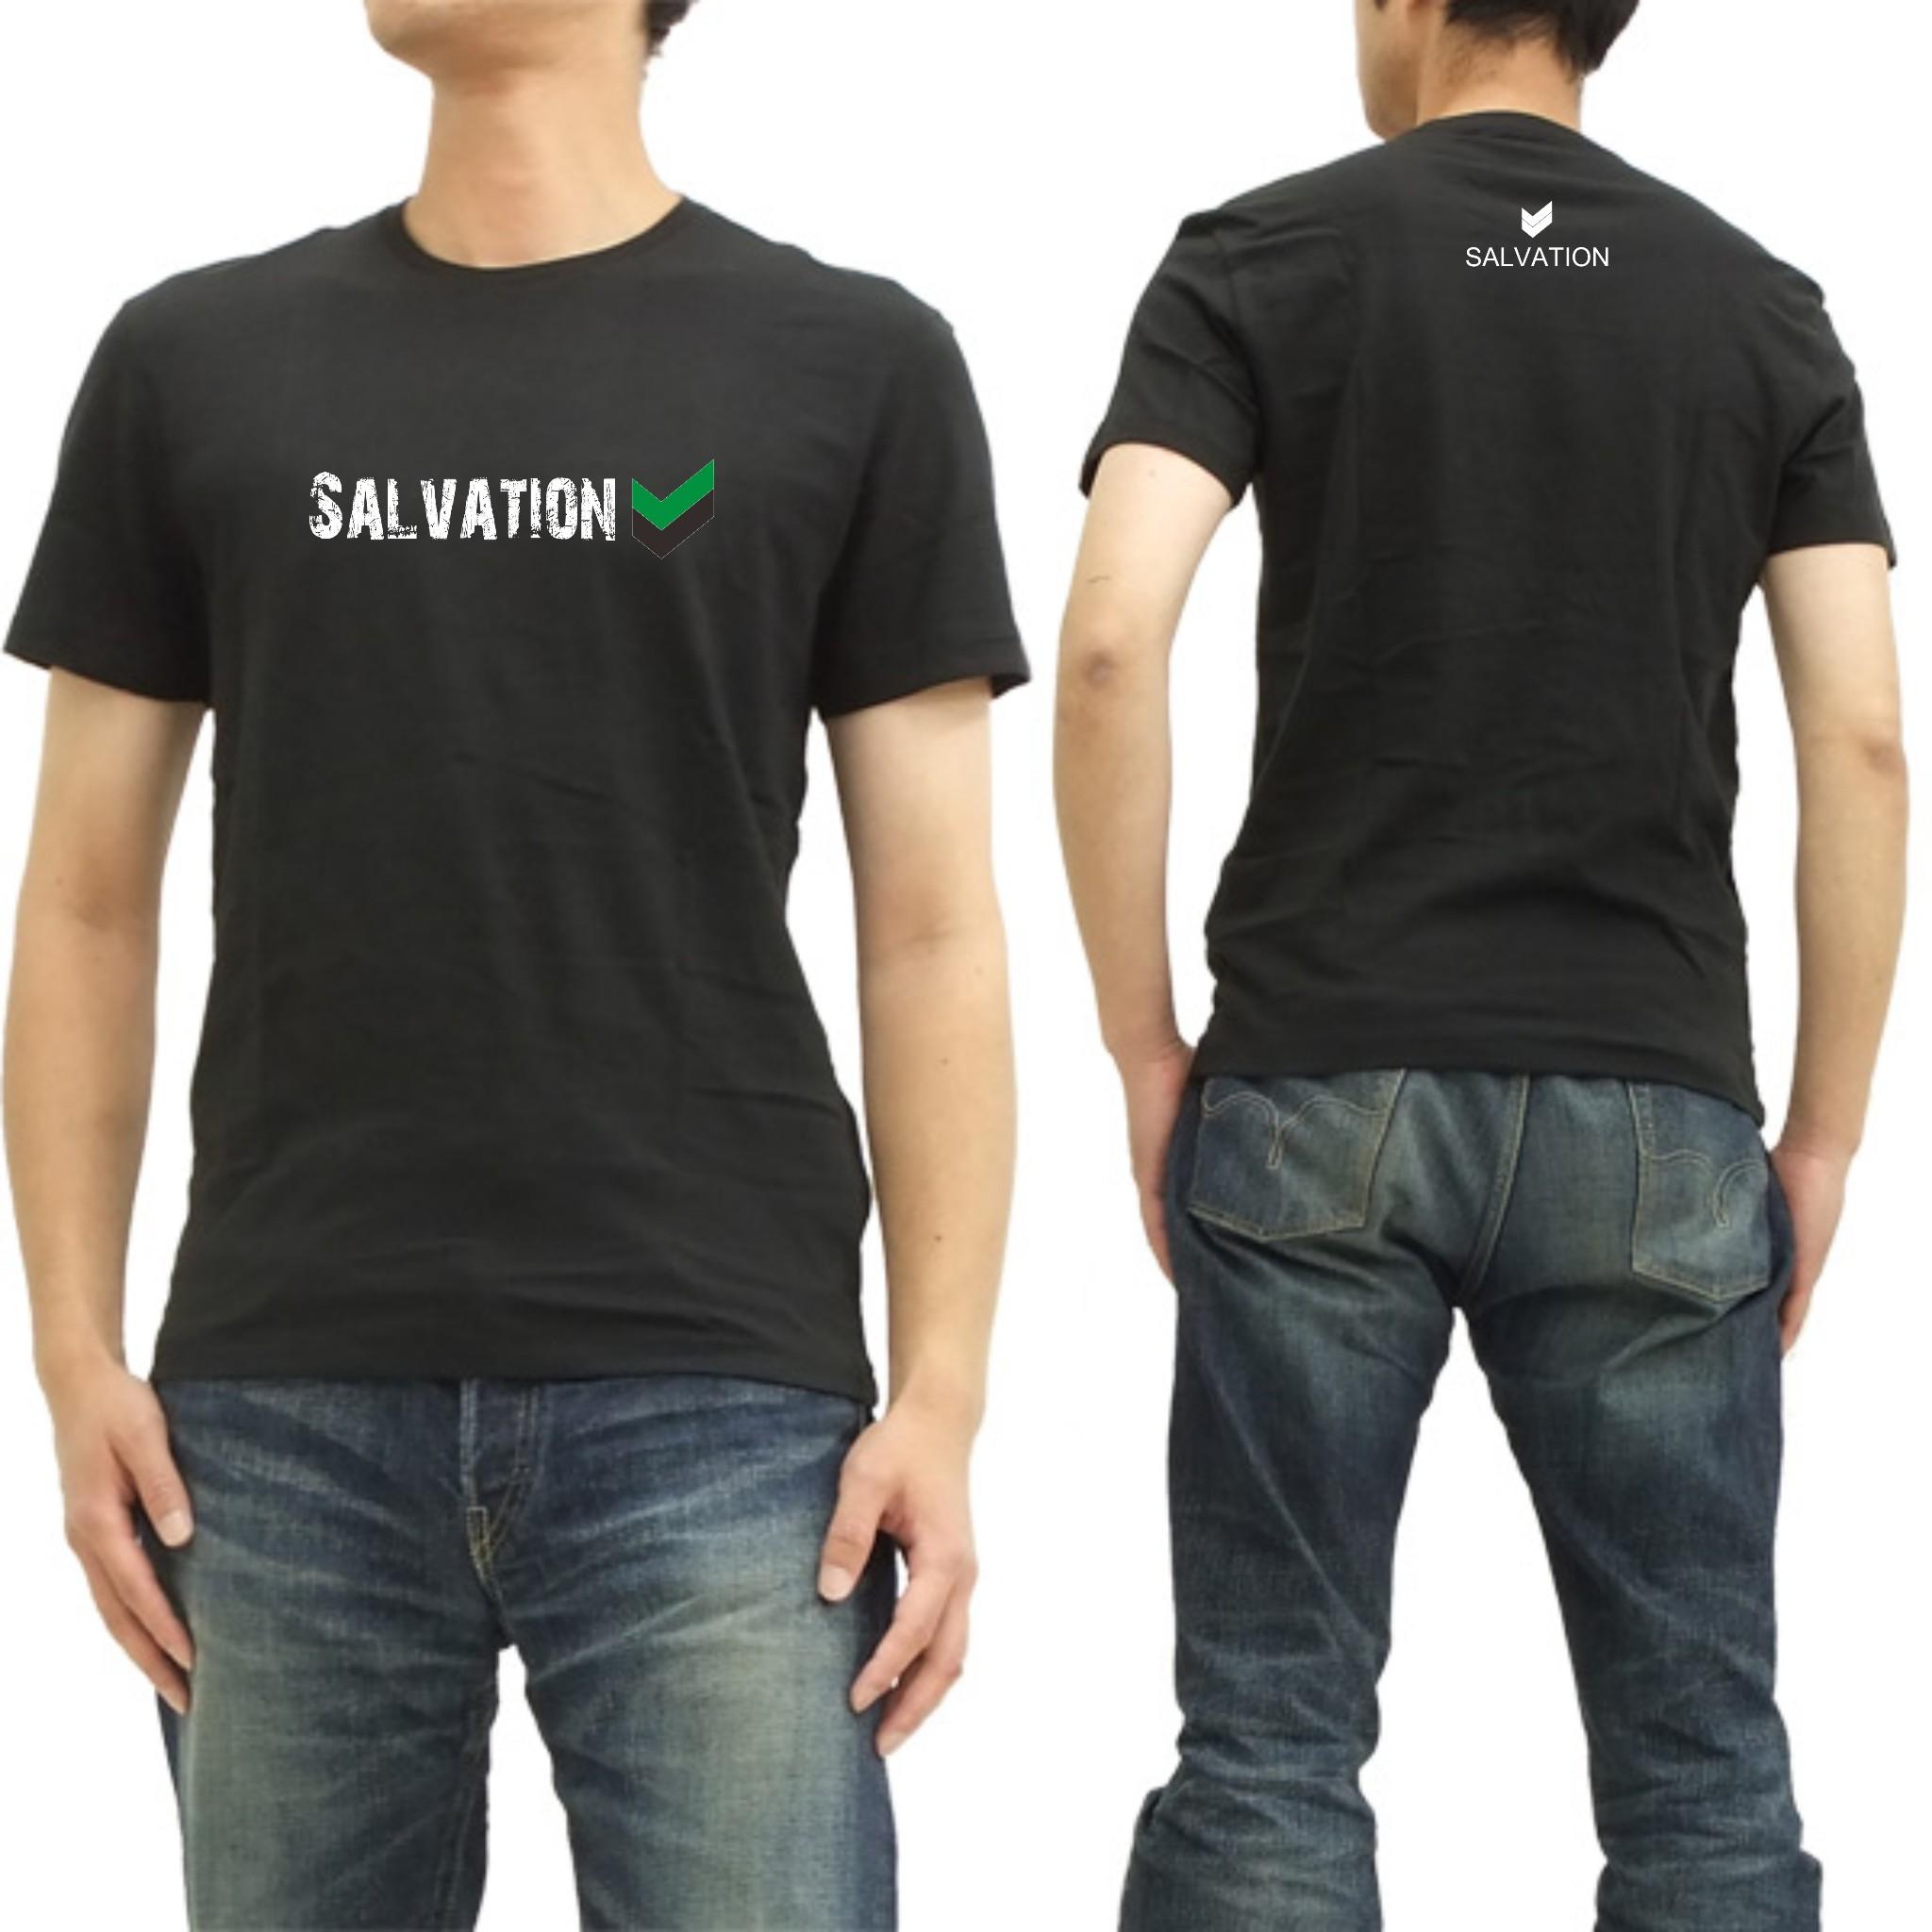 Black t shirt front and back plain - Blank Black T Shirt Back